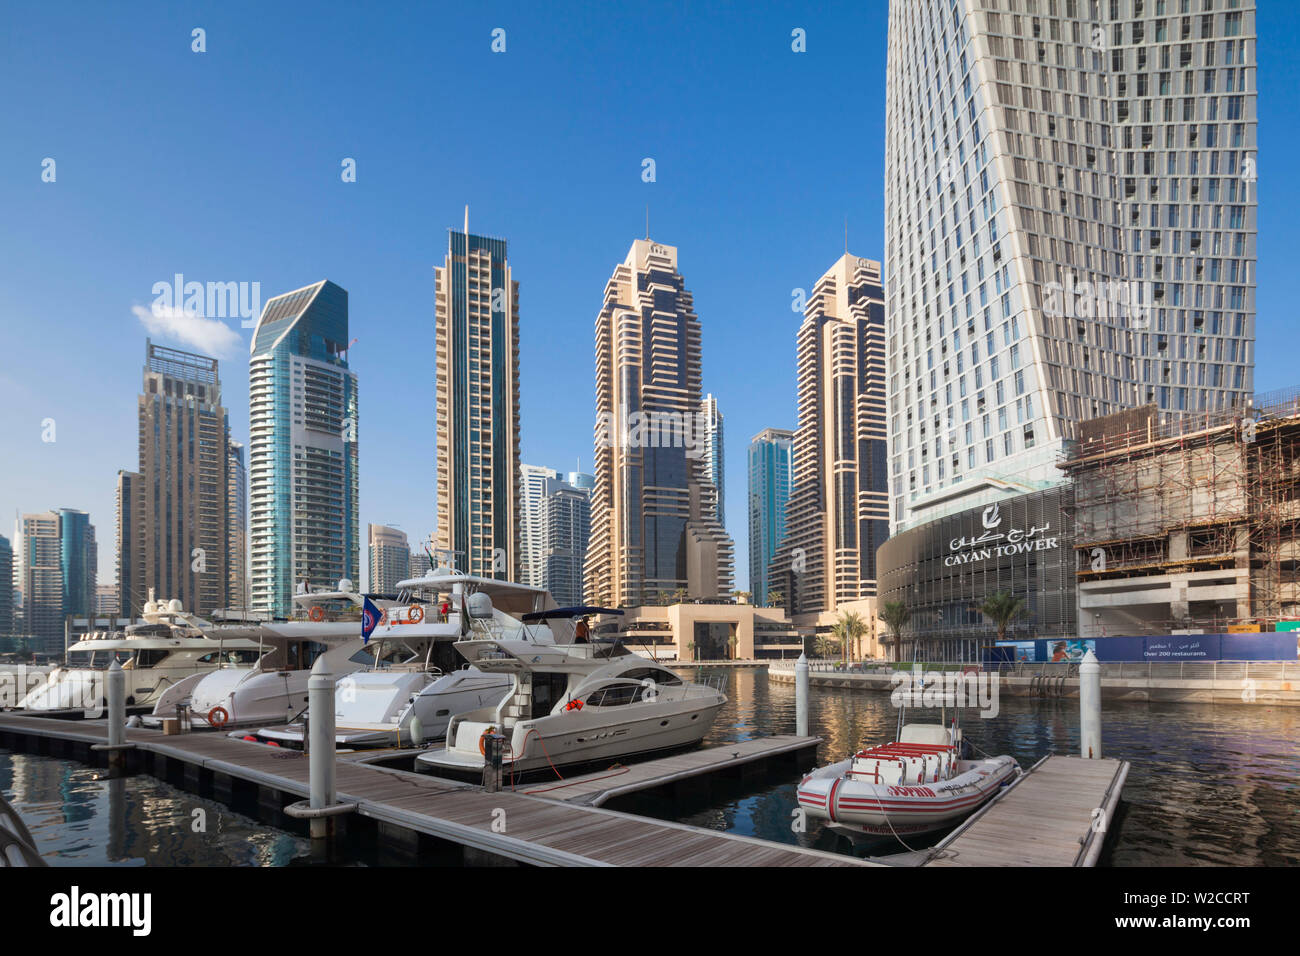 UAE, Dubai, Dubai Marina, high rise buildings including the twisted Cayan Tower, morning - Stock Image